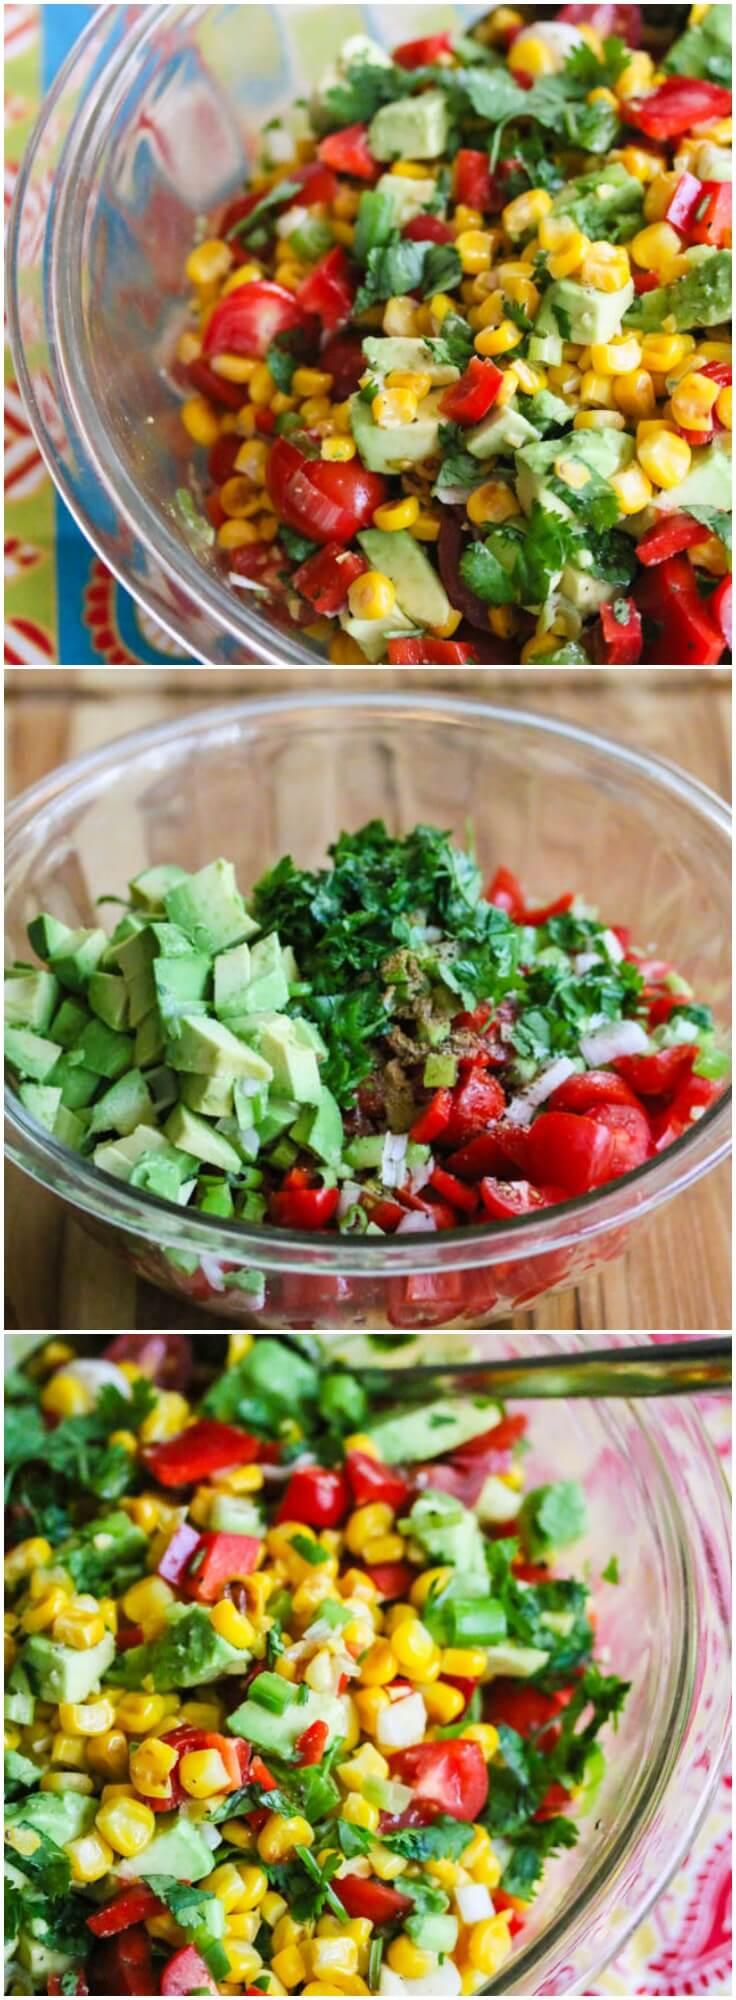 Corn-Tomato-Avocado-Salad-Collage